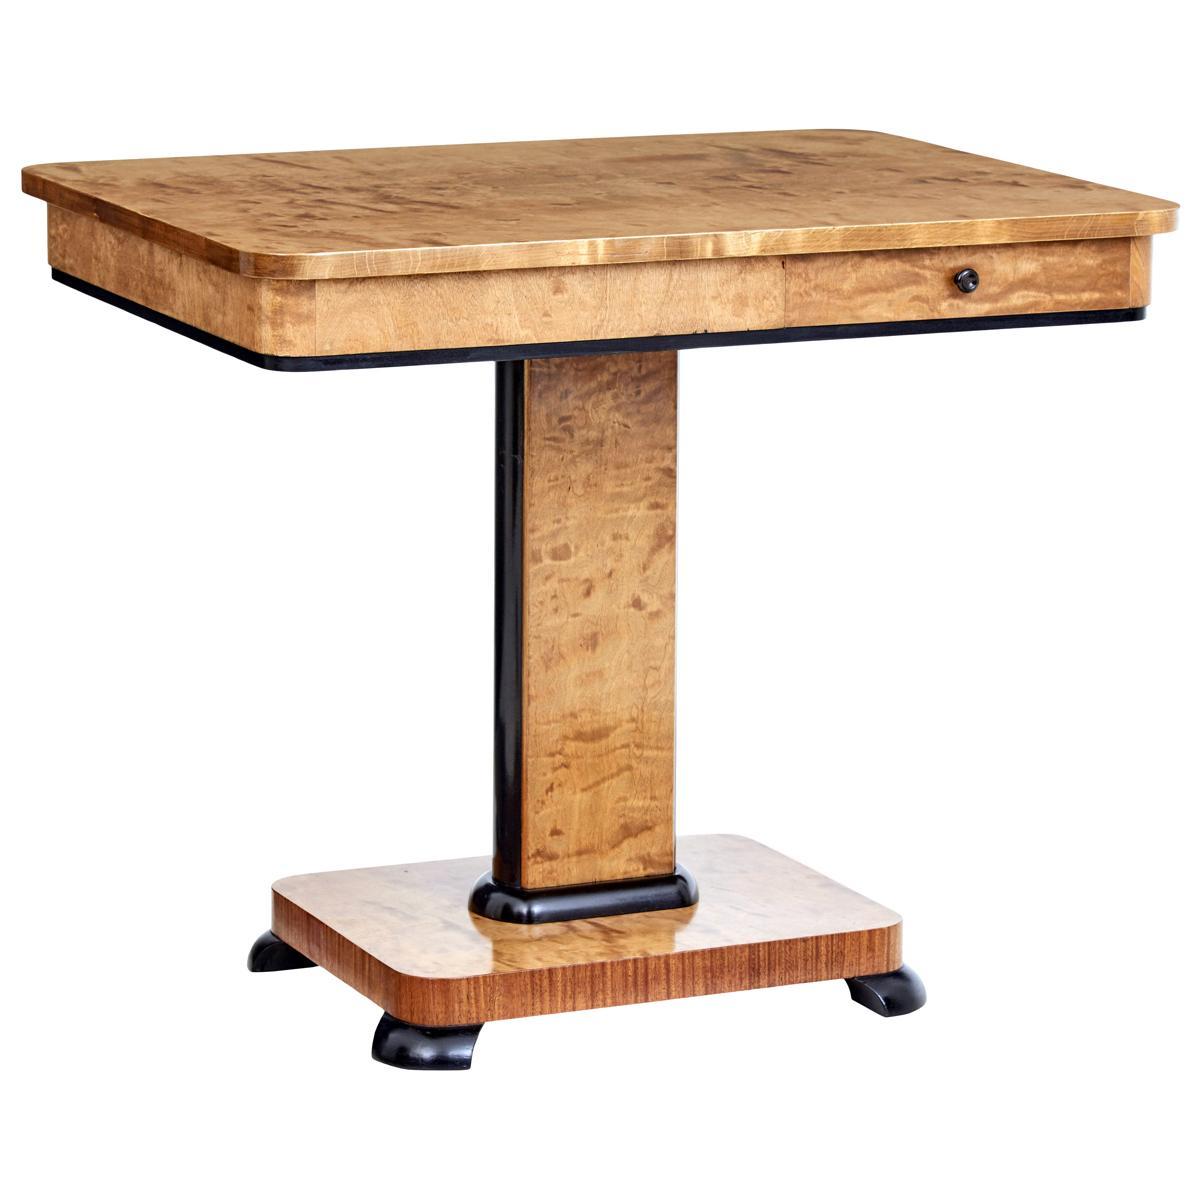 Swedish Mid-20th Century Birch Side Table